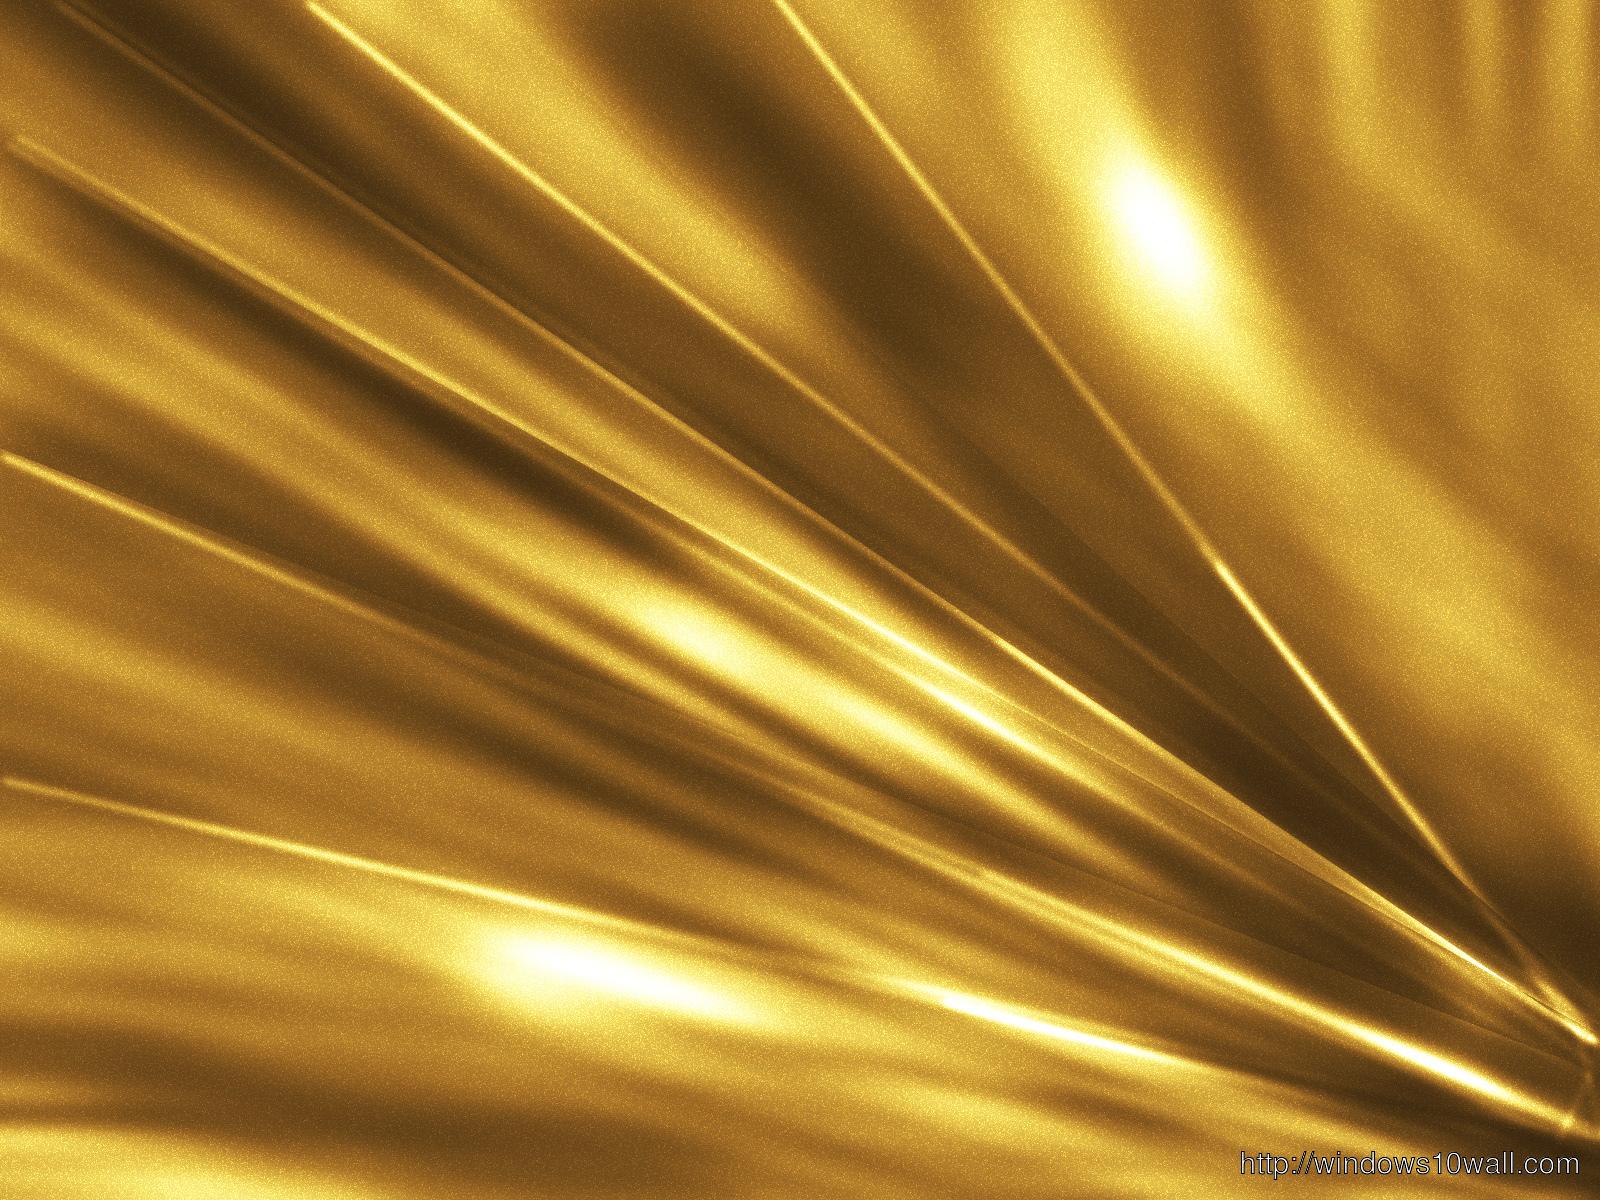 Gold Satin Background Wallpaper